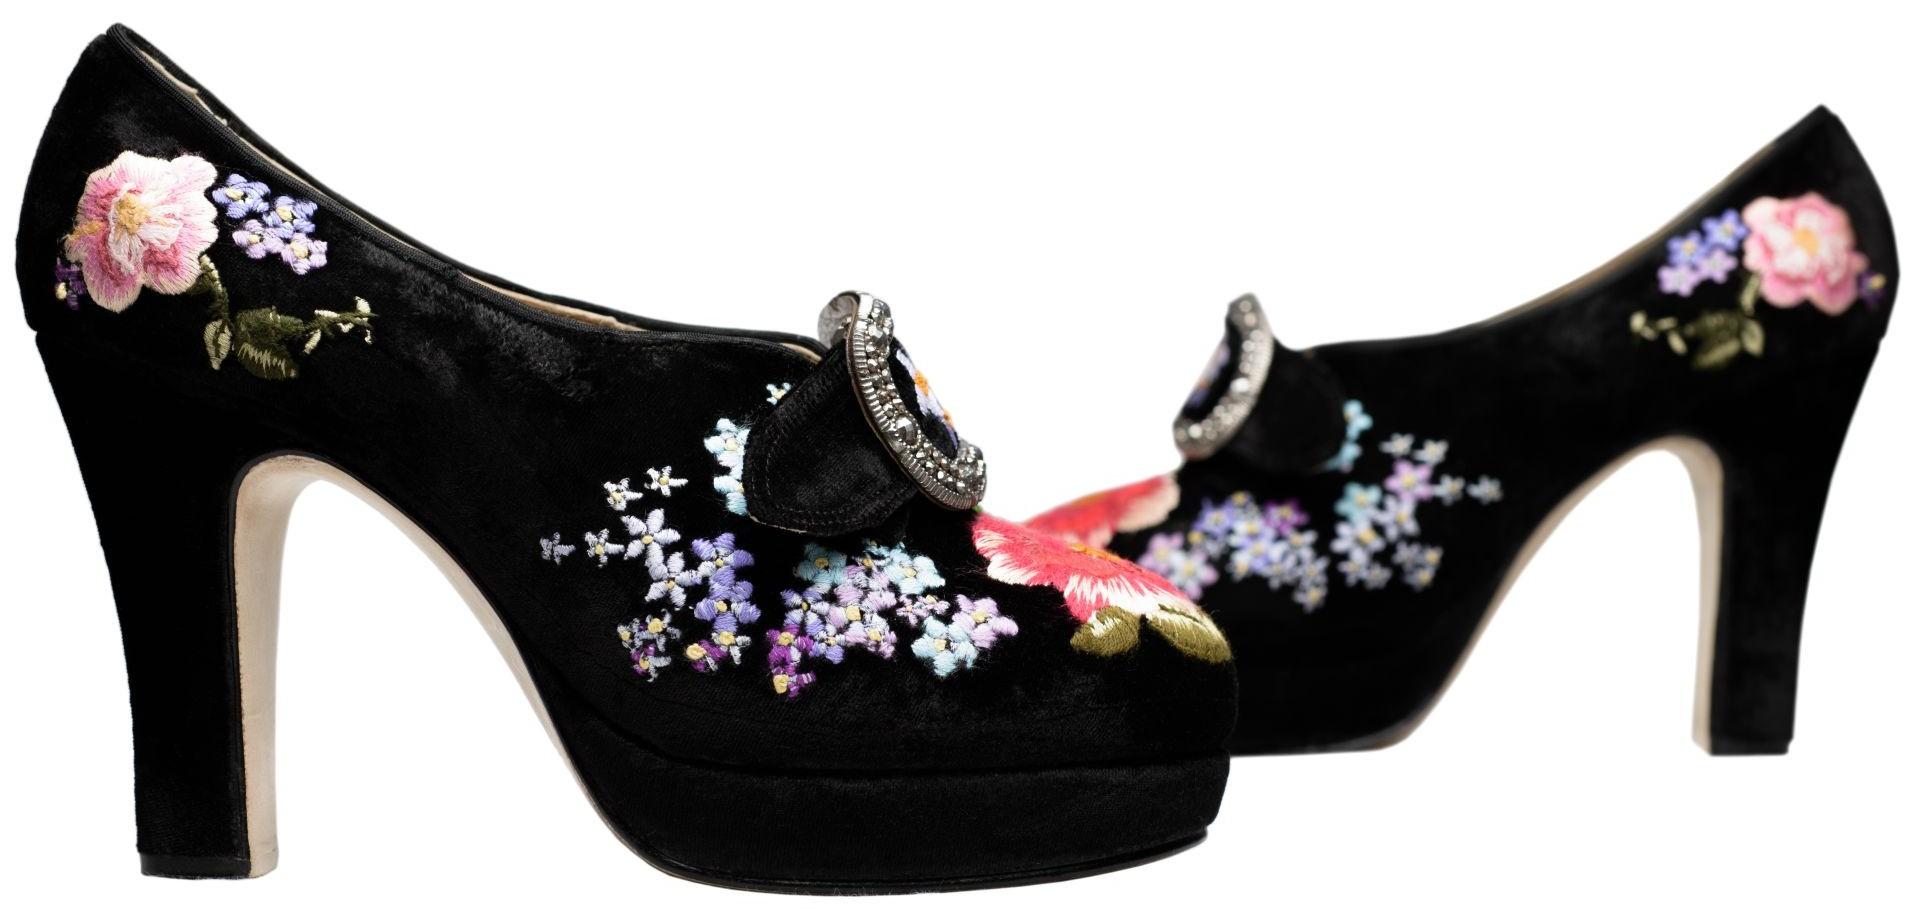 Gypsy Shoes Uk